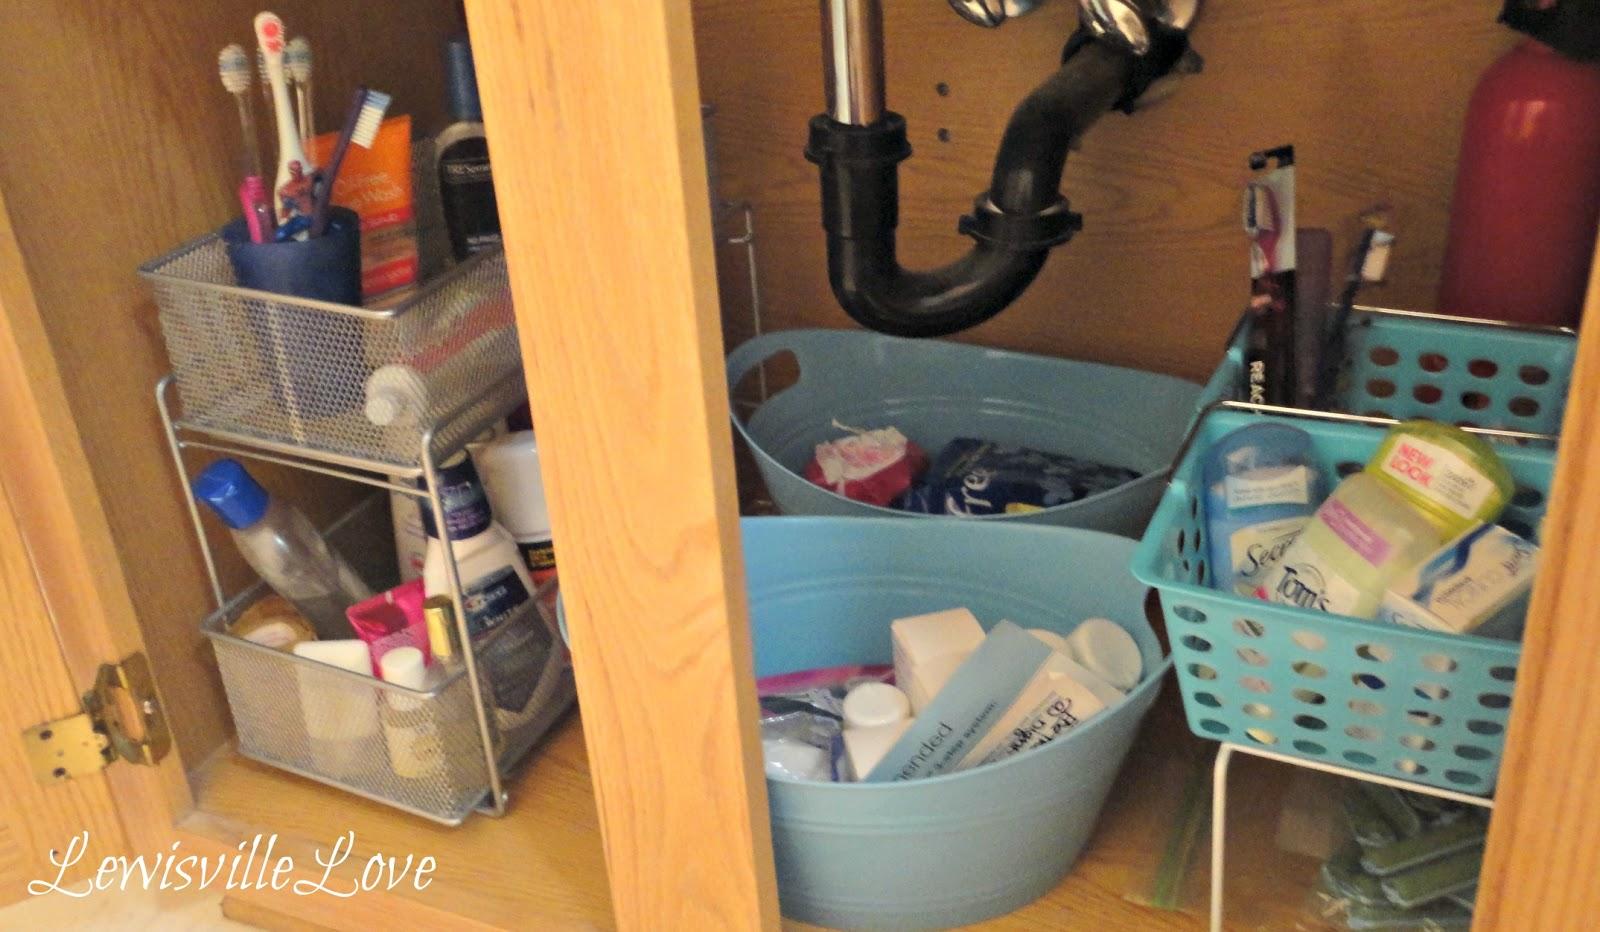 Lewisville Love Organizing The Messy Vanity